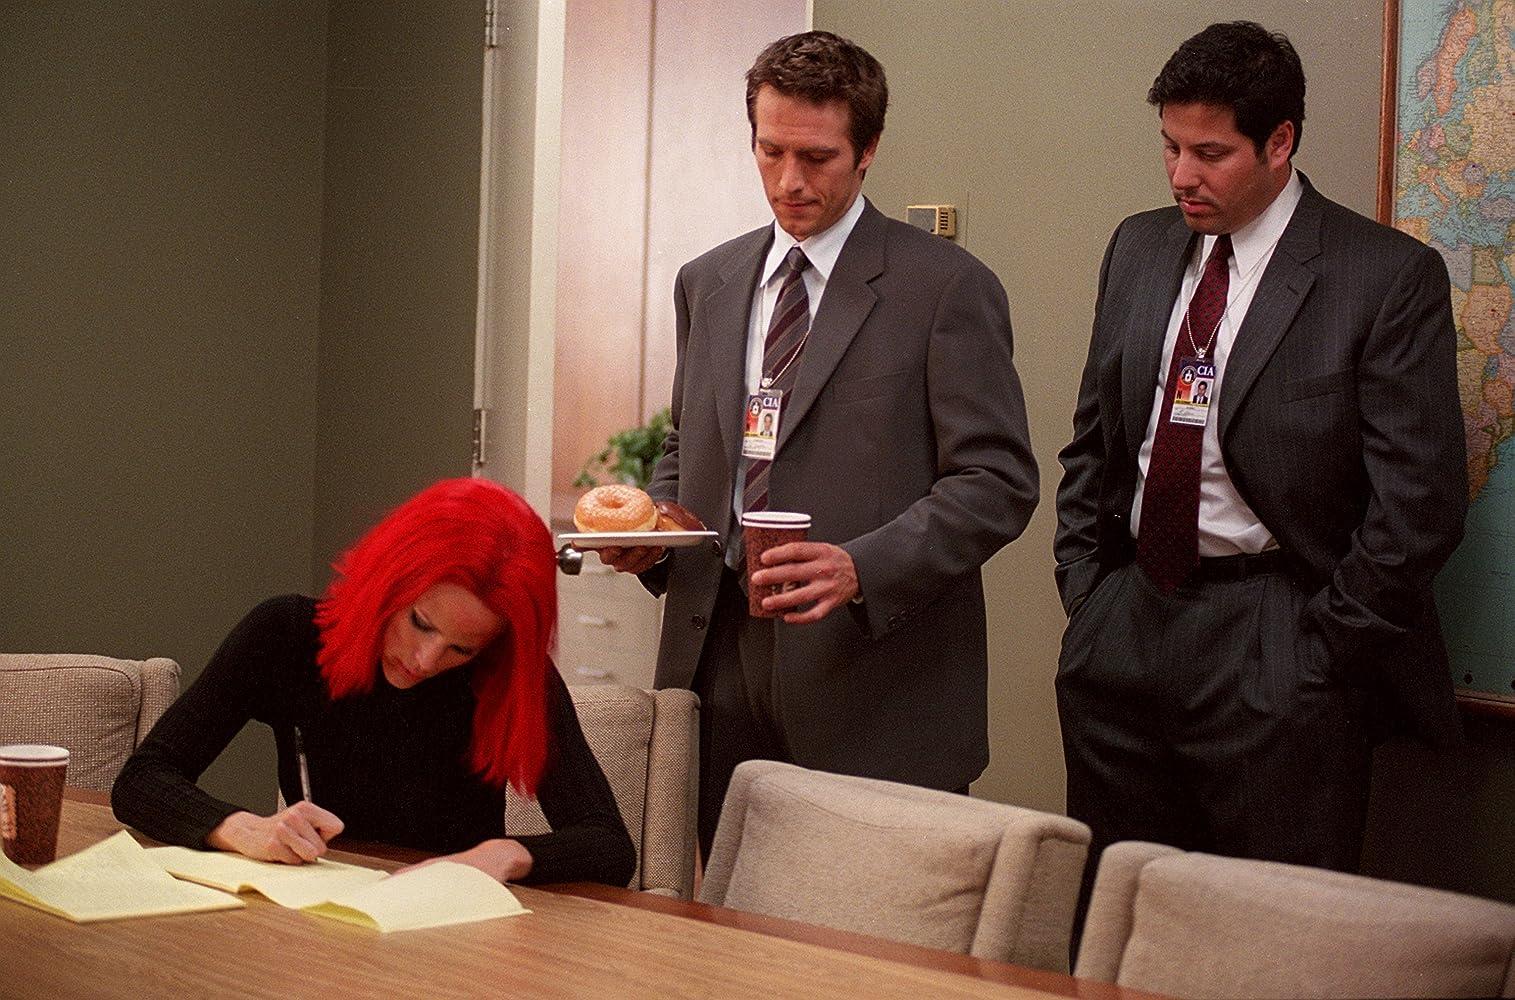 Jennifer Garner, Greg Grunberg, and Michael Vartan in Alias (2001)